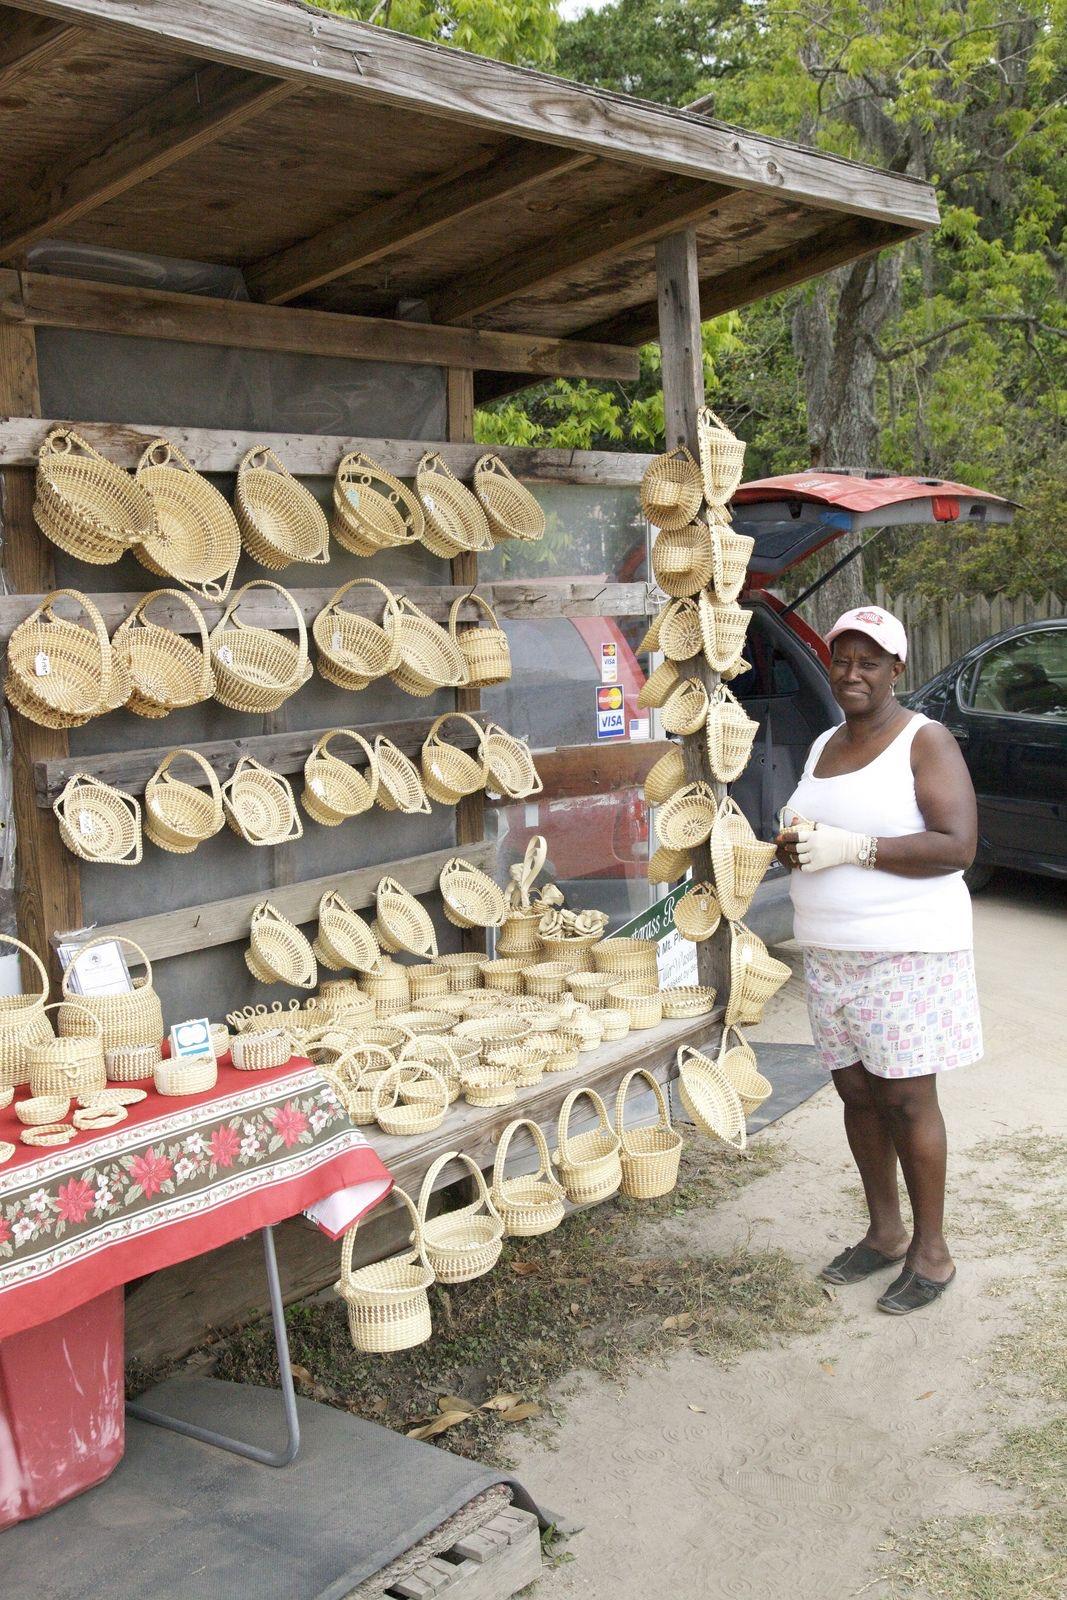 Sweetgrass basket weaver along Route 17, Mount Pleasant, Charleston County, South Carolina